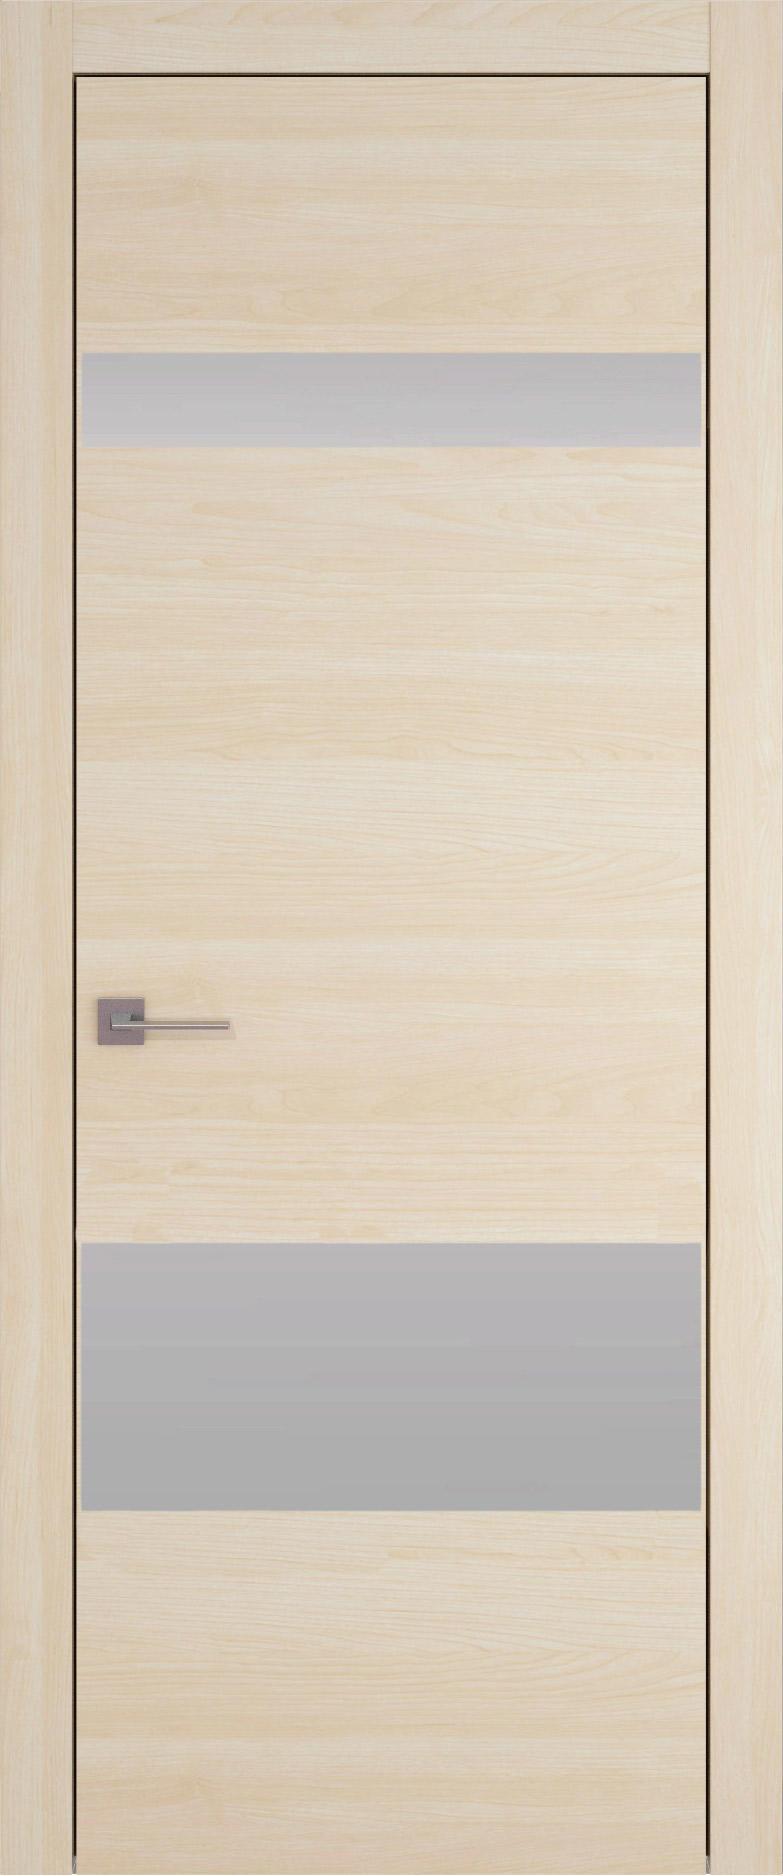 Tivoli К-4 цвет - Клен Без стекла (ДГ)